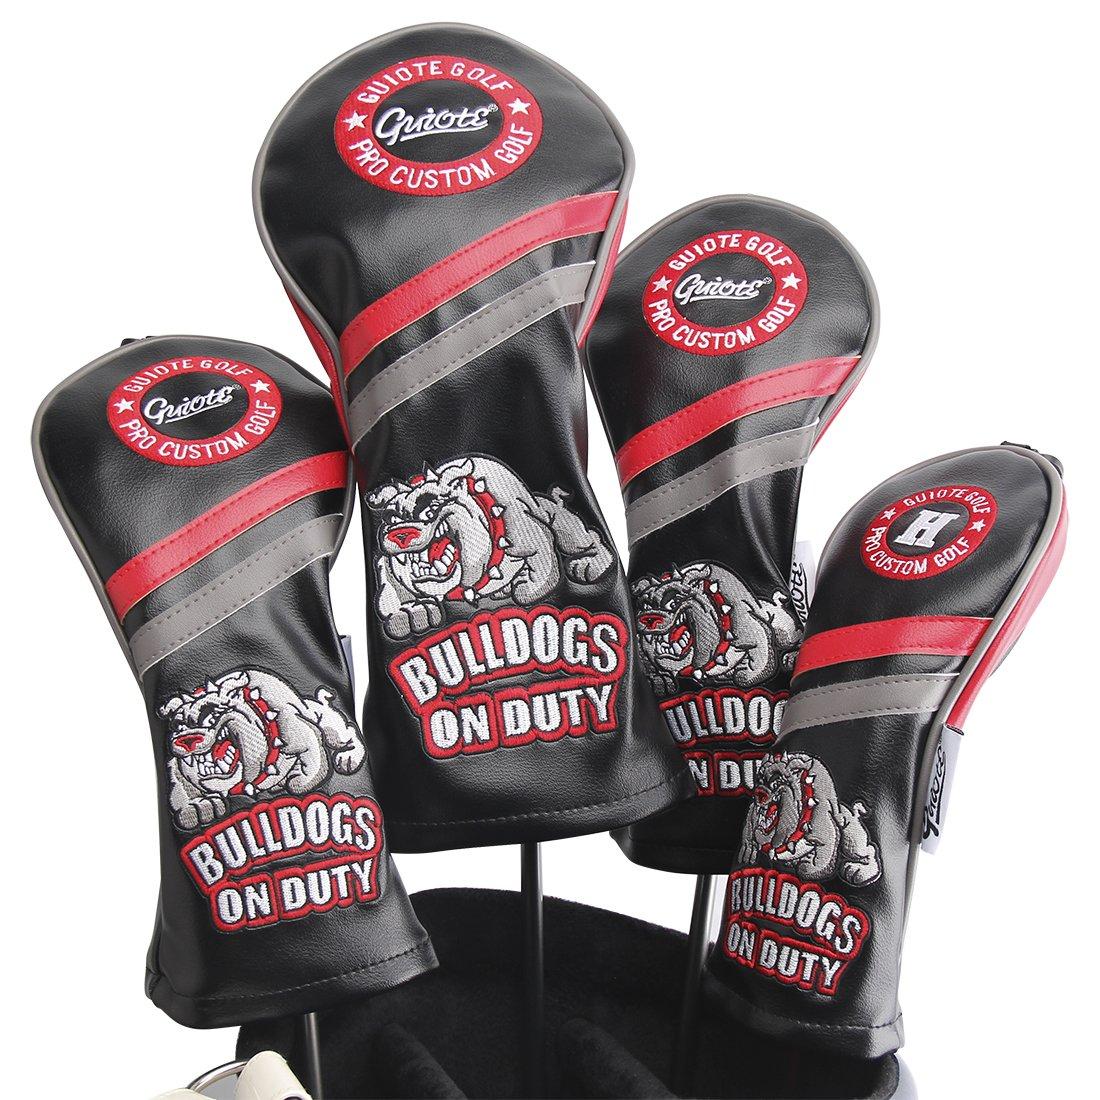 Guiote ゴルフヘッドカバー Golf head covers クラブヘッドカバー ウッドカバー ドライバー 新デザイン 交換可能な番号タグ付き(#2.#3.#4.#5.X) 4個セット B076NP9WJL Bulldogs-Black Bulldogs-Black